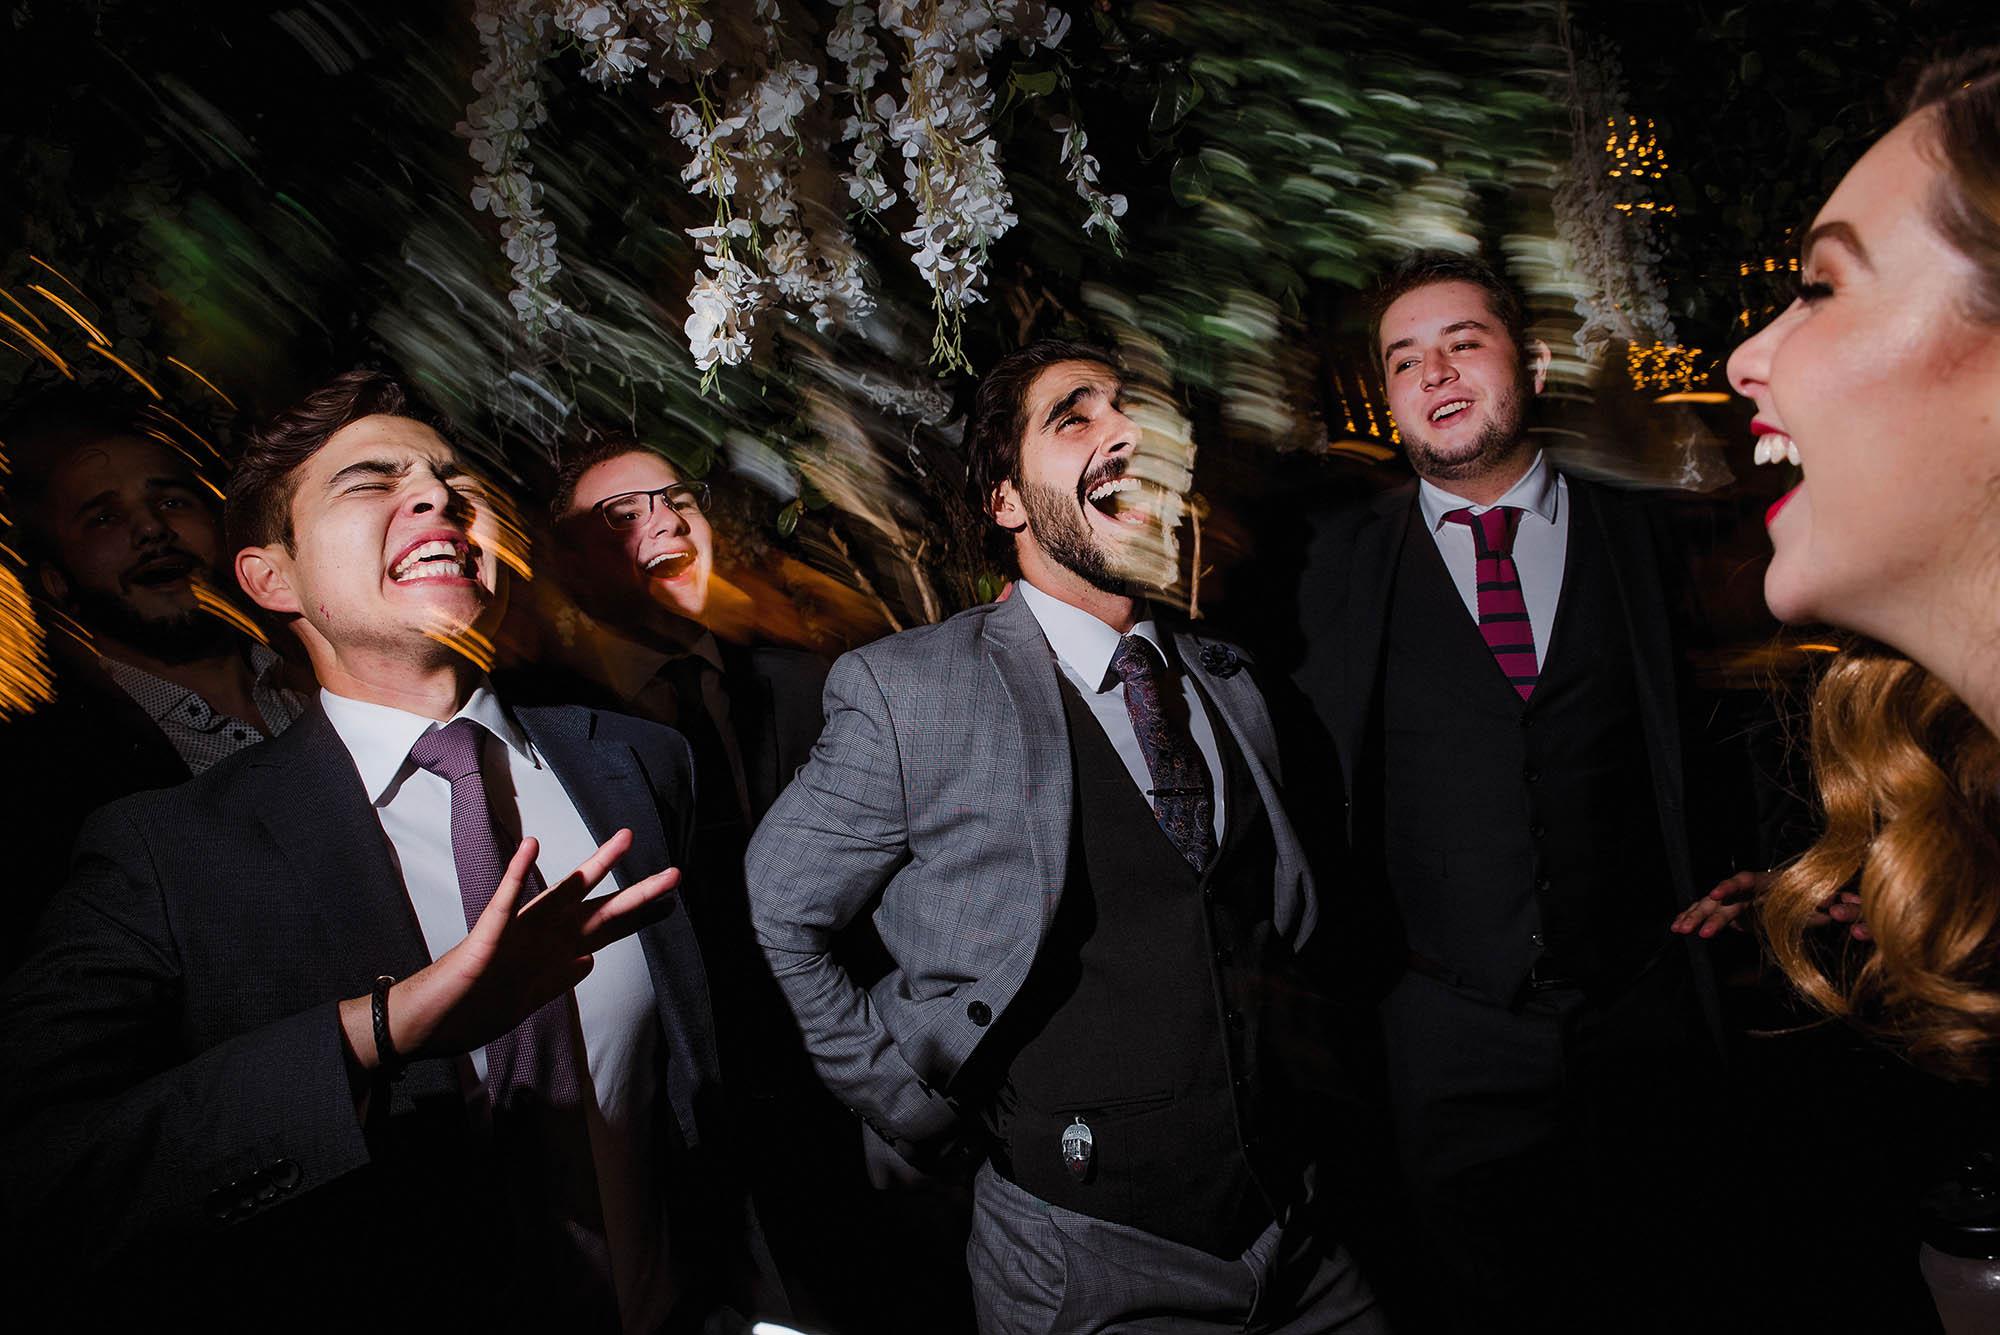 magali fotografo hacienda escoba guadalajara boda wedding 35.jpg